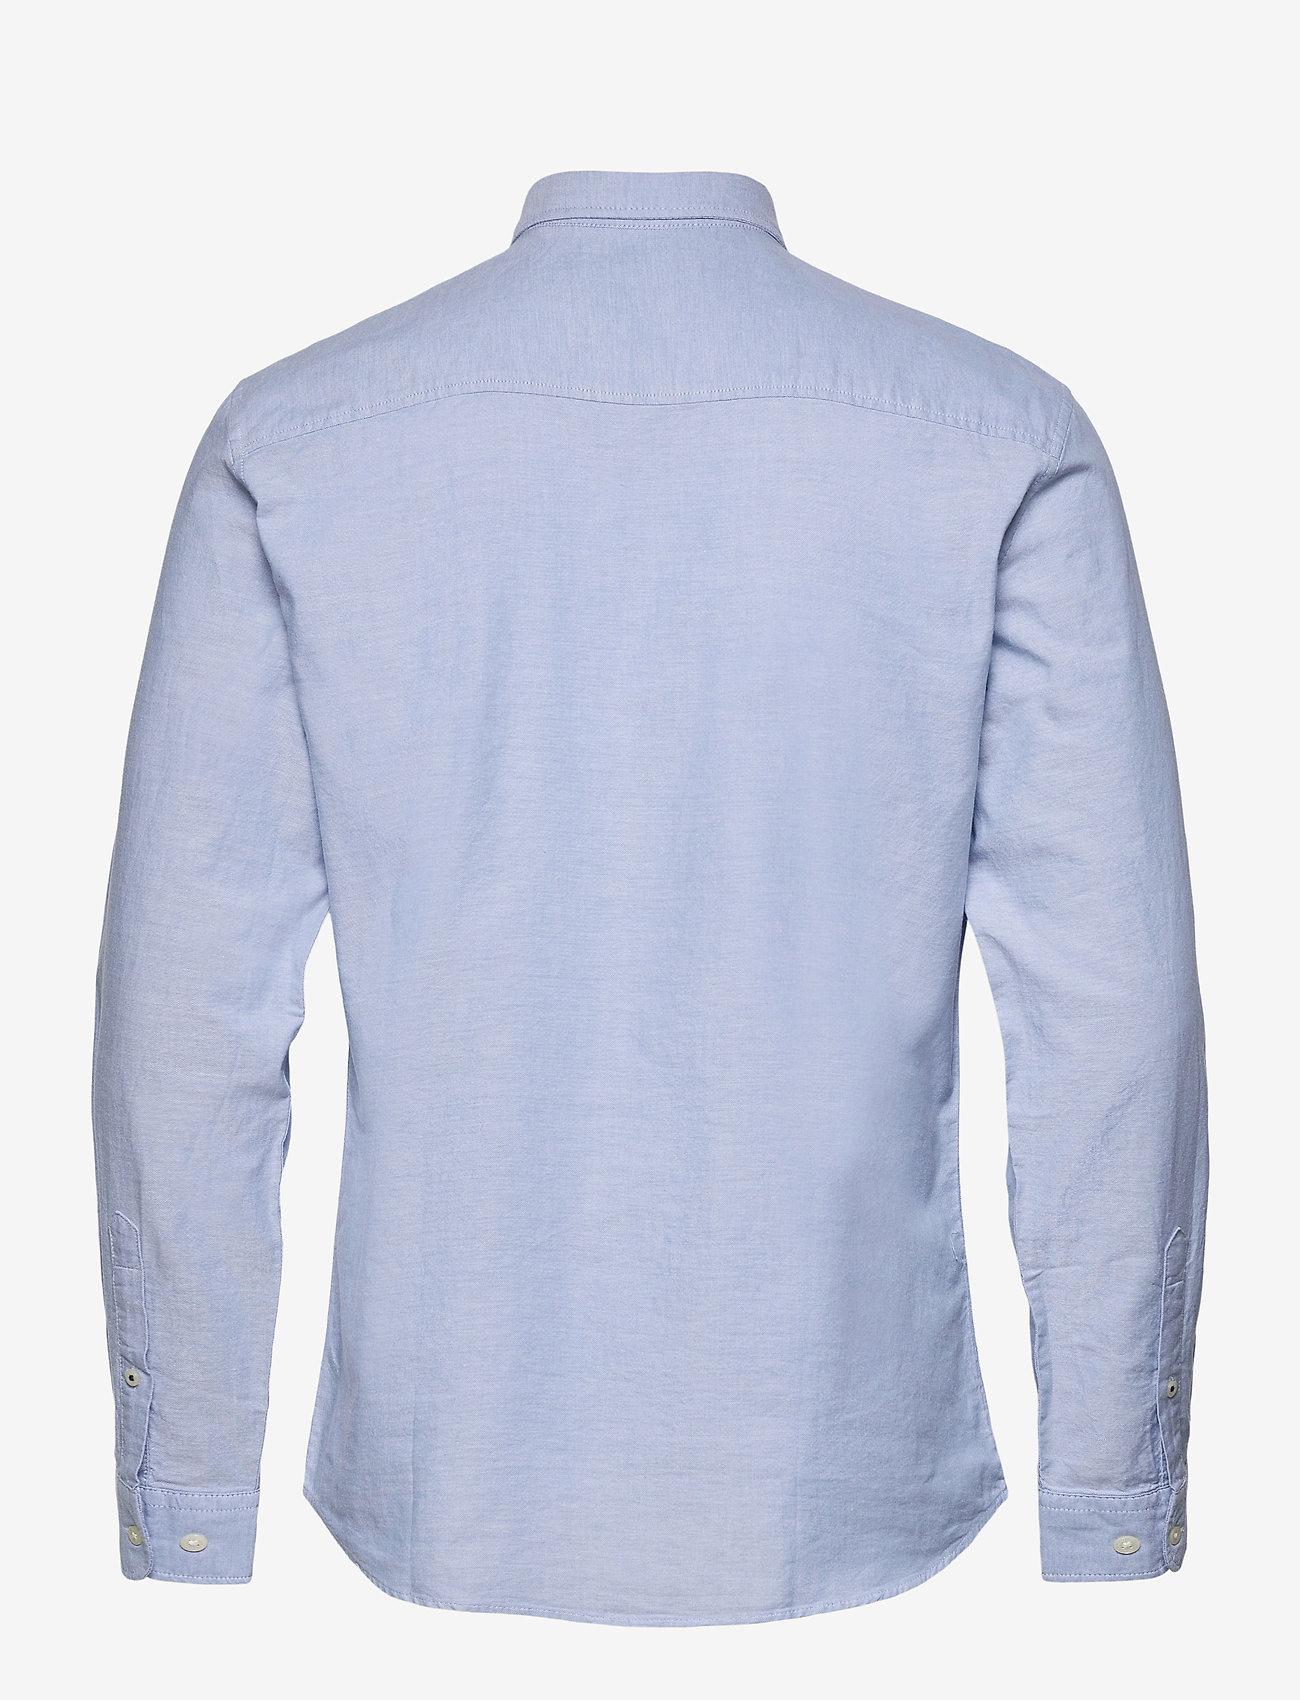 Jack & Jones - JJEOXFORD SHIRT L/S S21 - casual skjortor - cashmere blue - 1